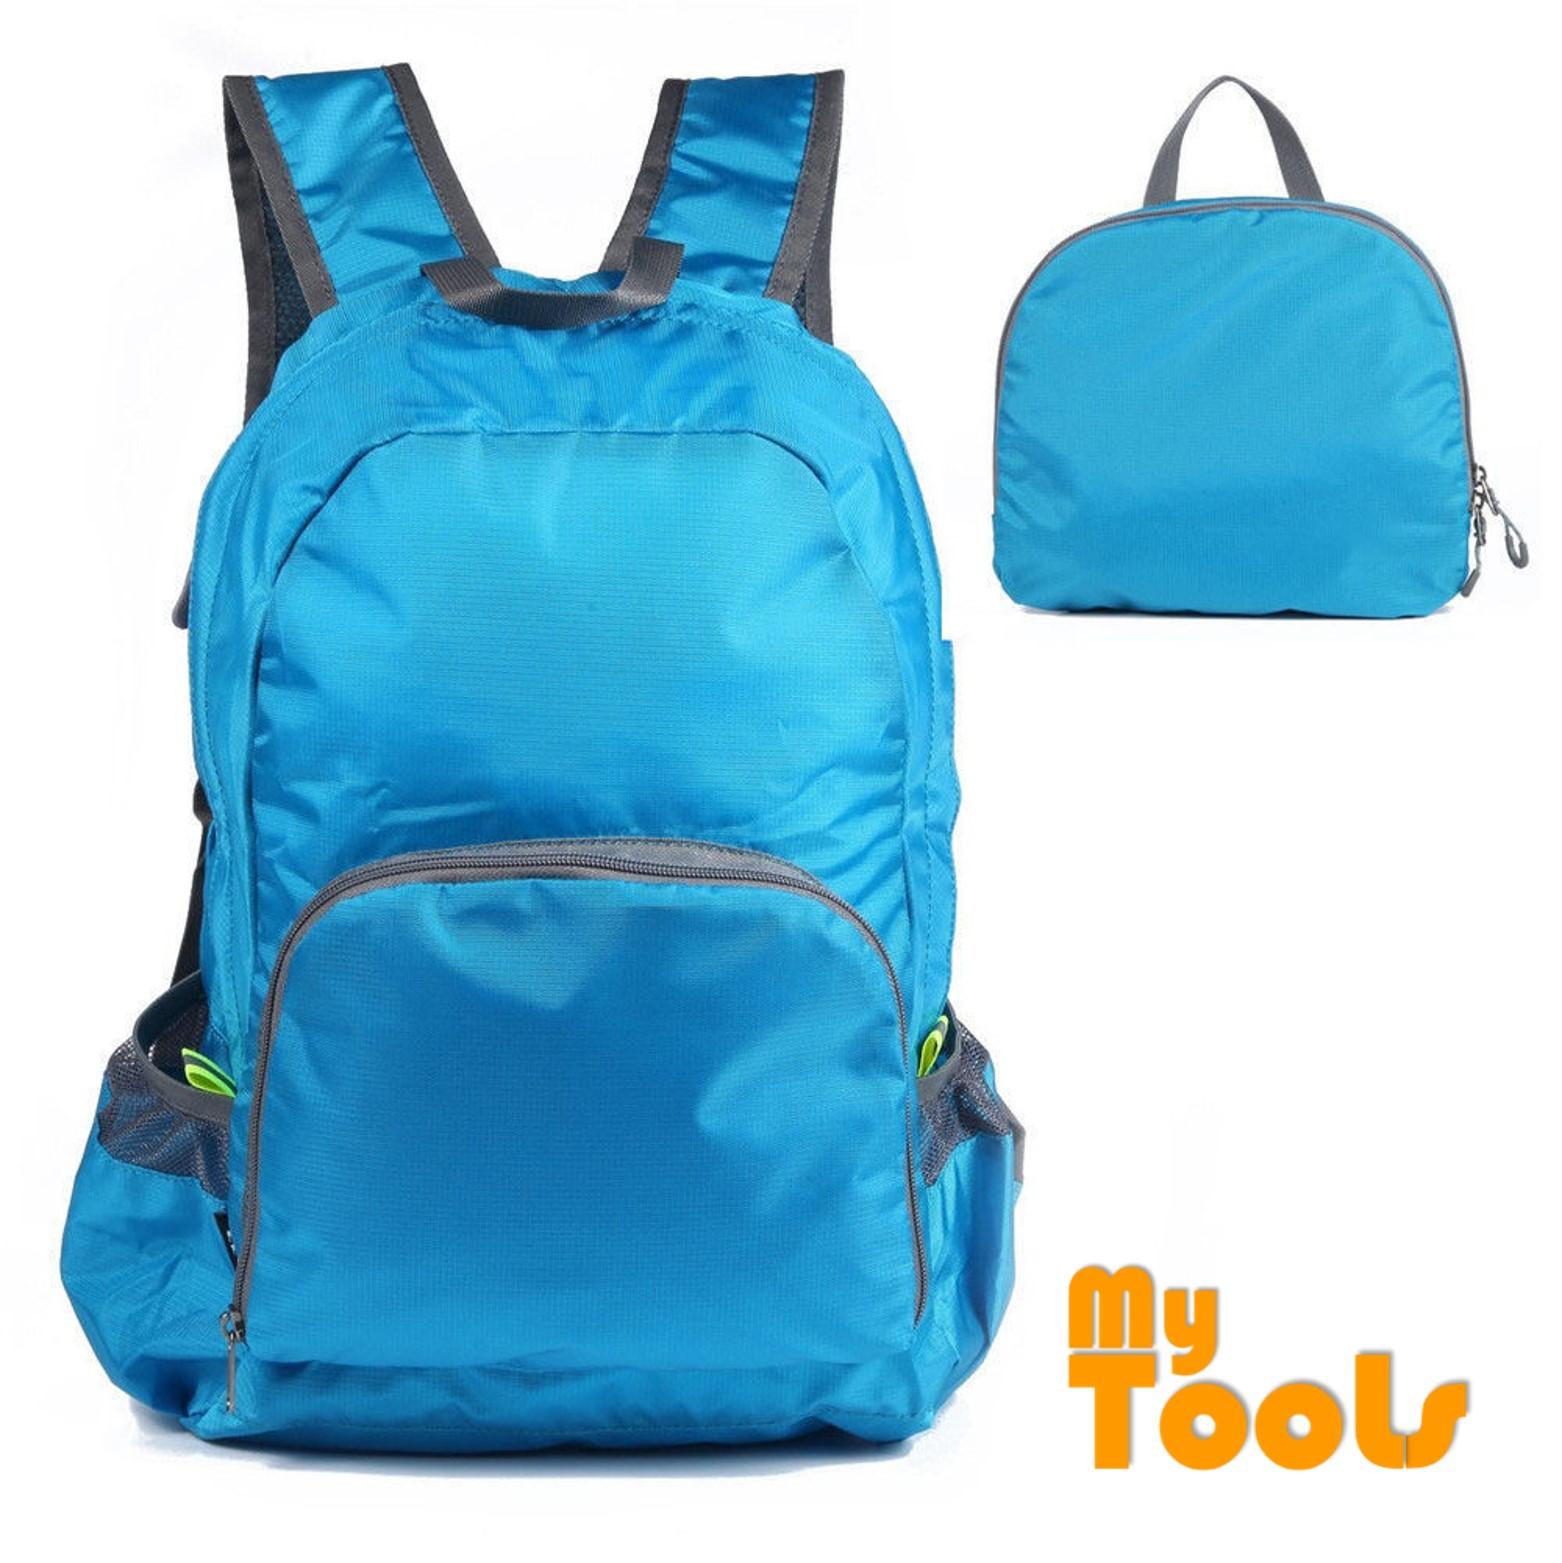 Mytools Foldable Waterproof Lightweight Nylon Travel Backpack